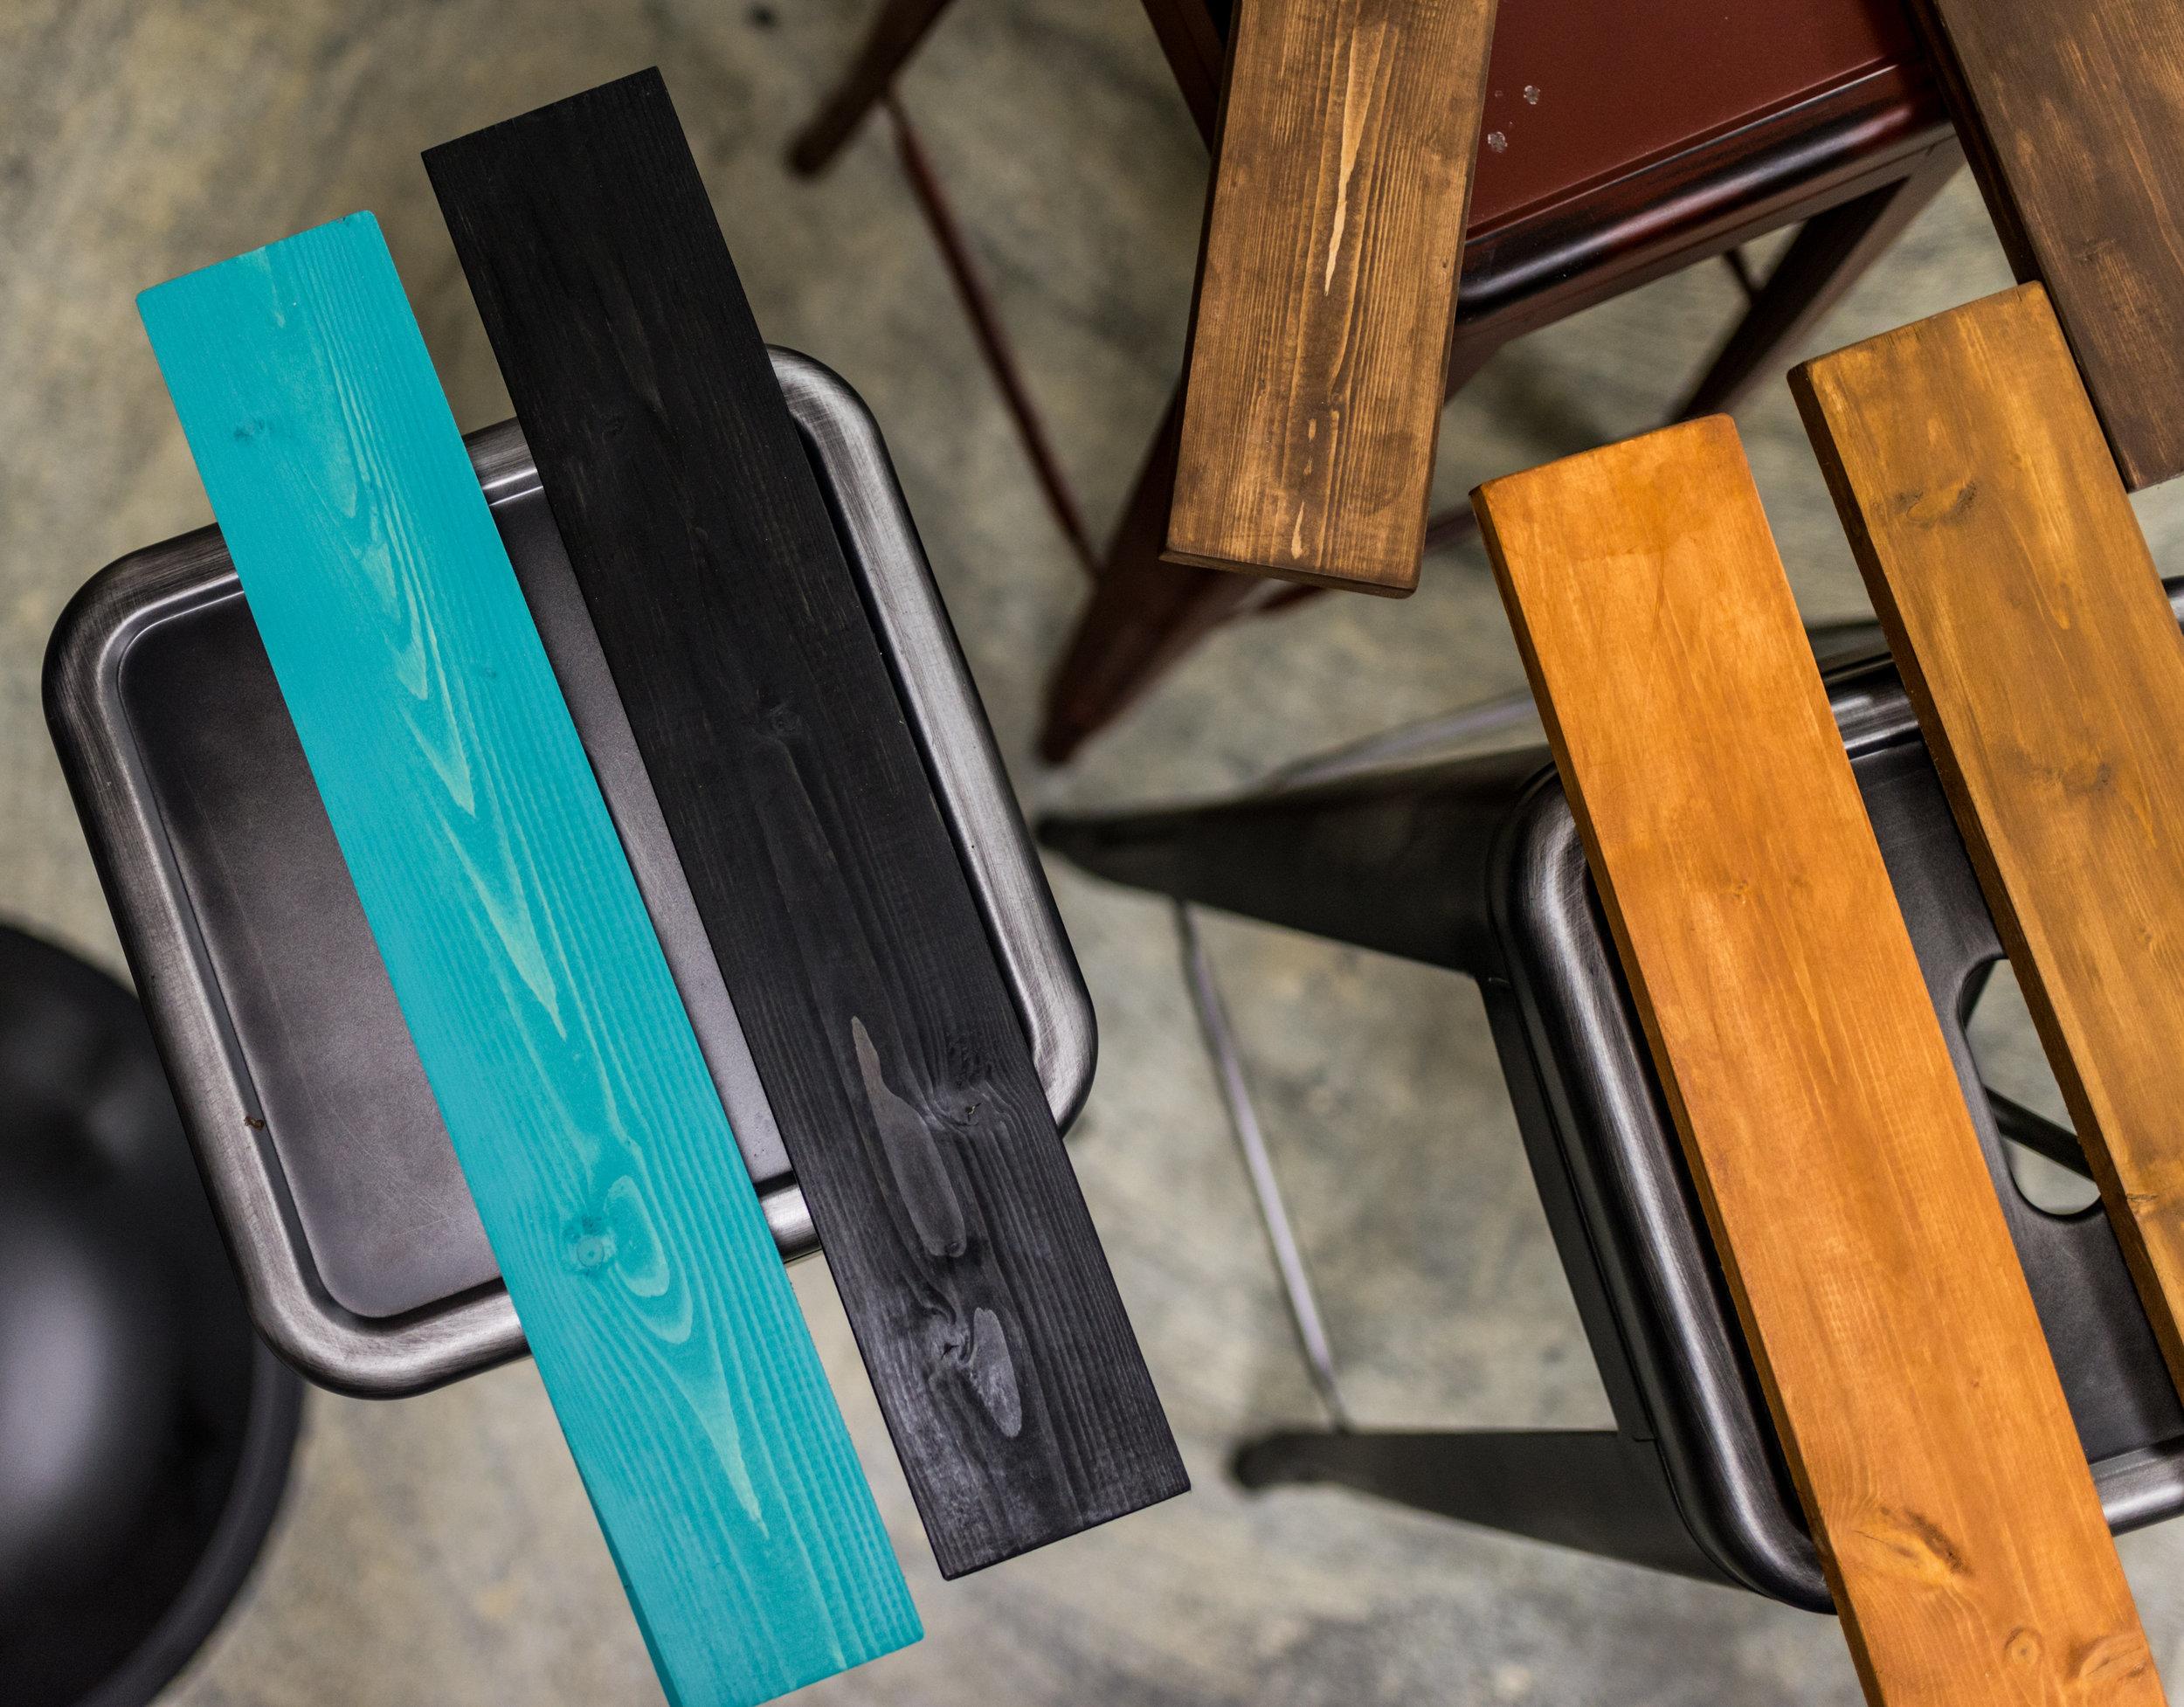 BoardwalkDIYstudio1.31.18-0020.jpg